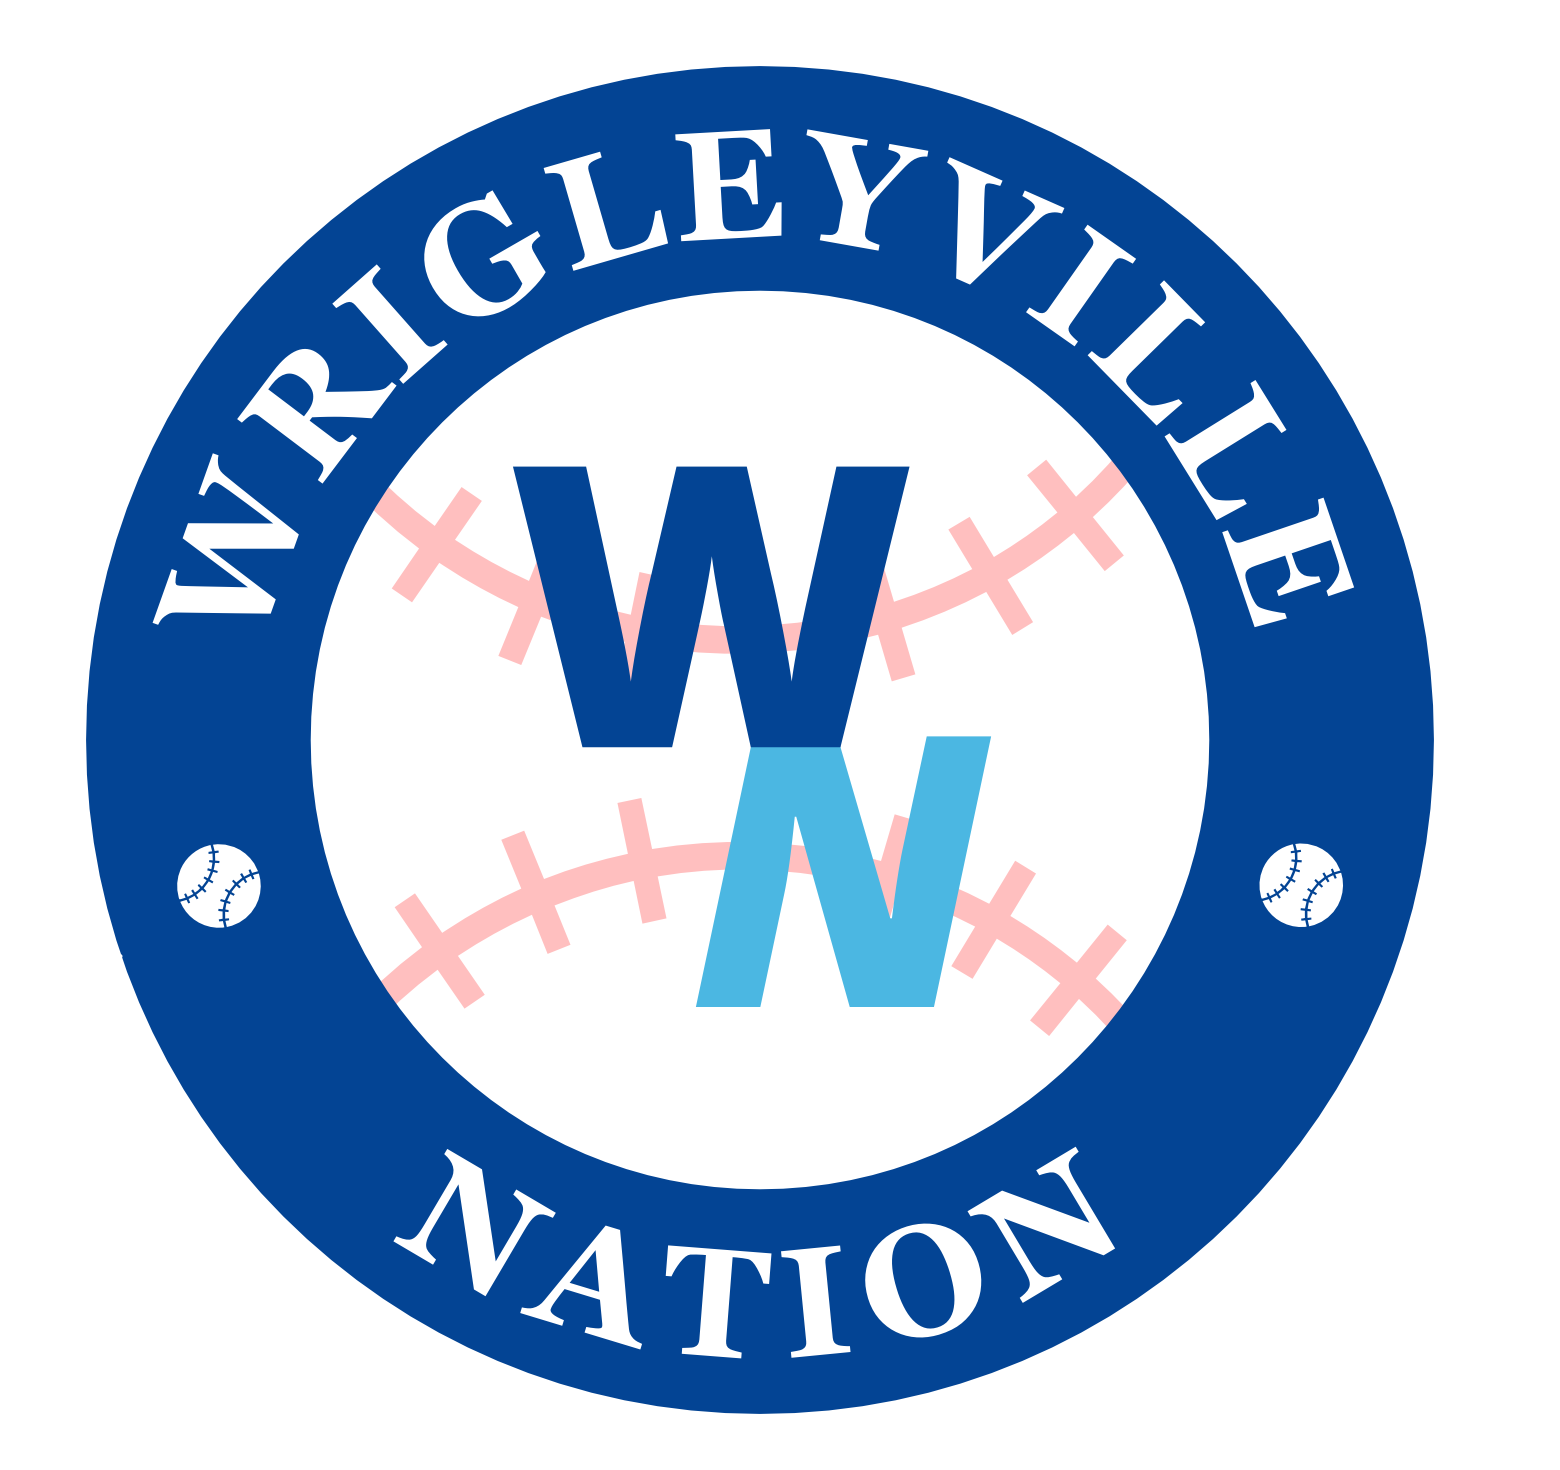 Artwork for Wrigleyville Nation Ep 197 - Guest: Dave Wischnowsky, Remembering Bill Buckner, Bryant Injured, Recaps, News, & More